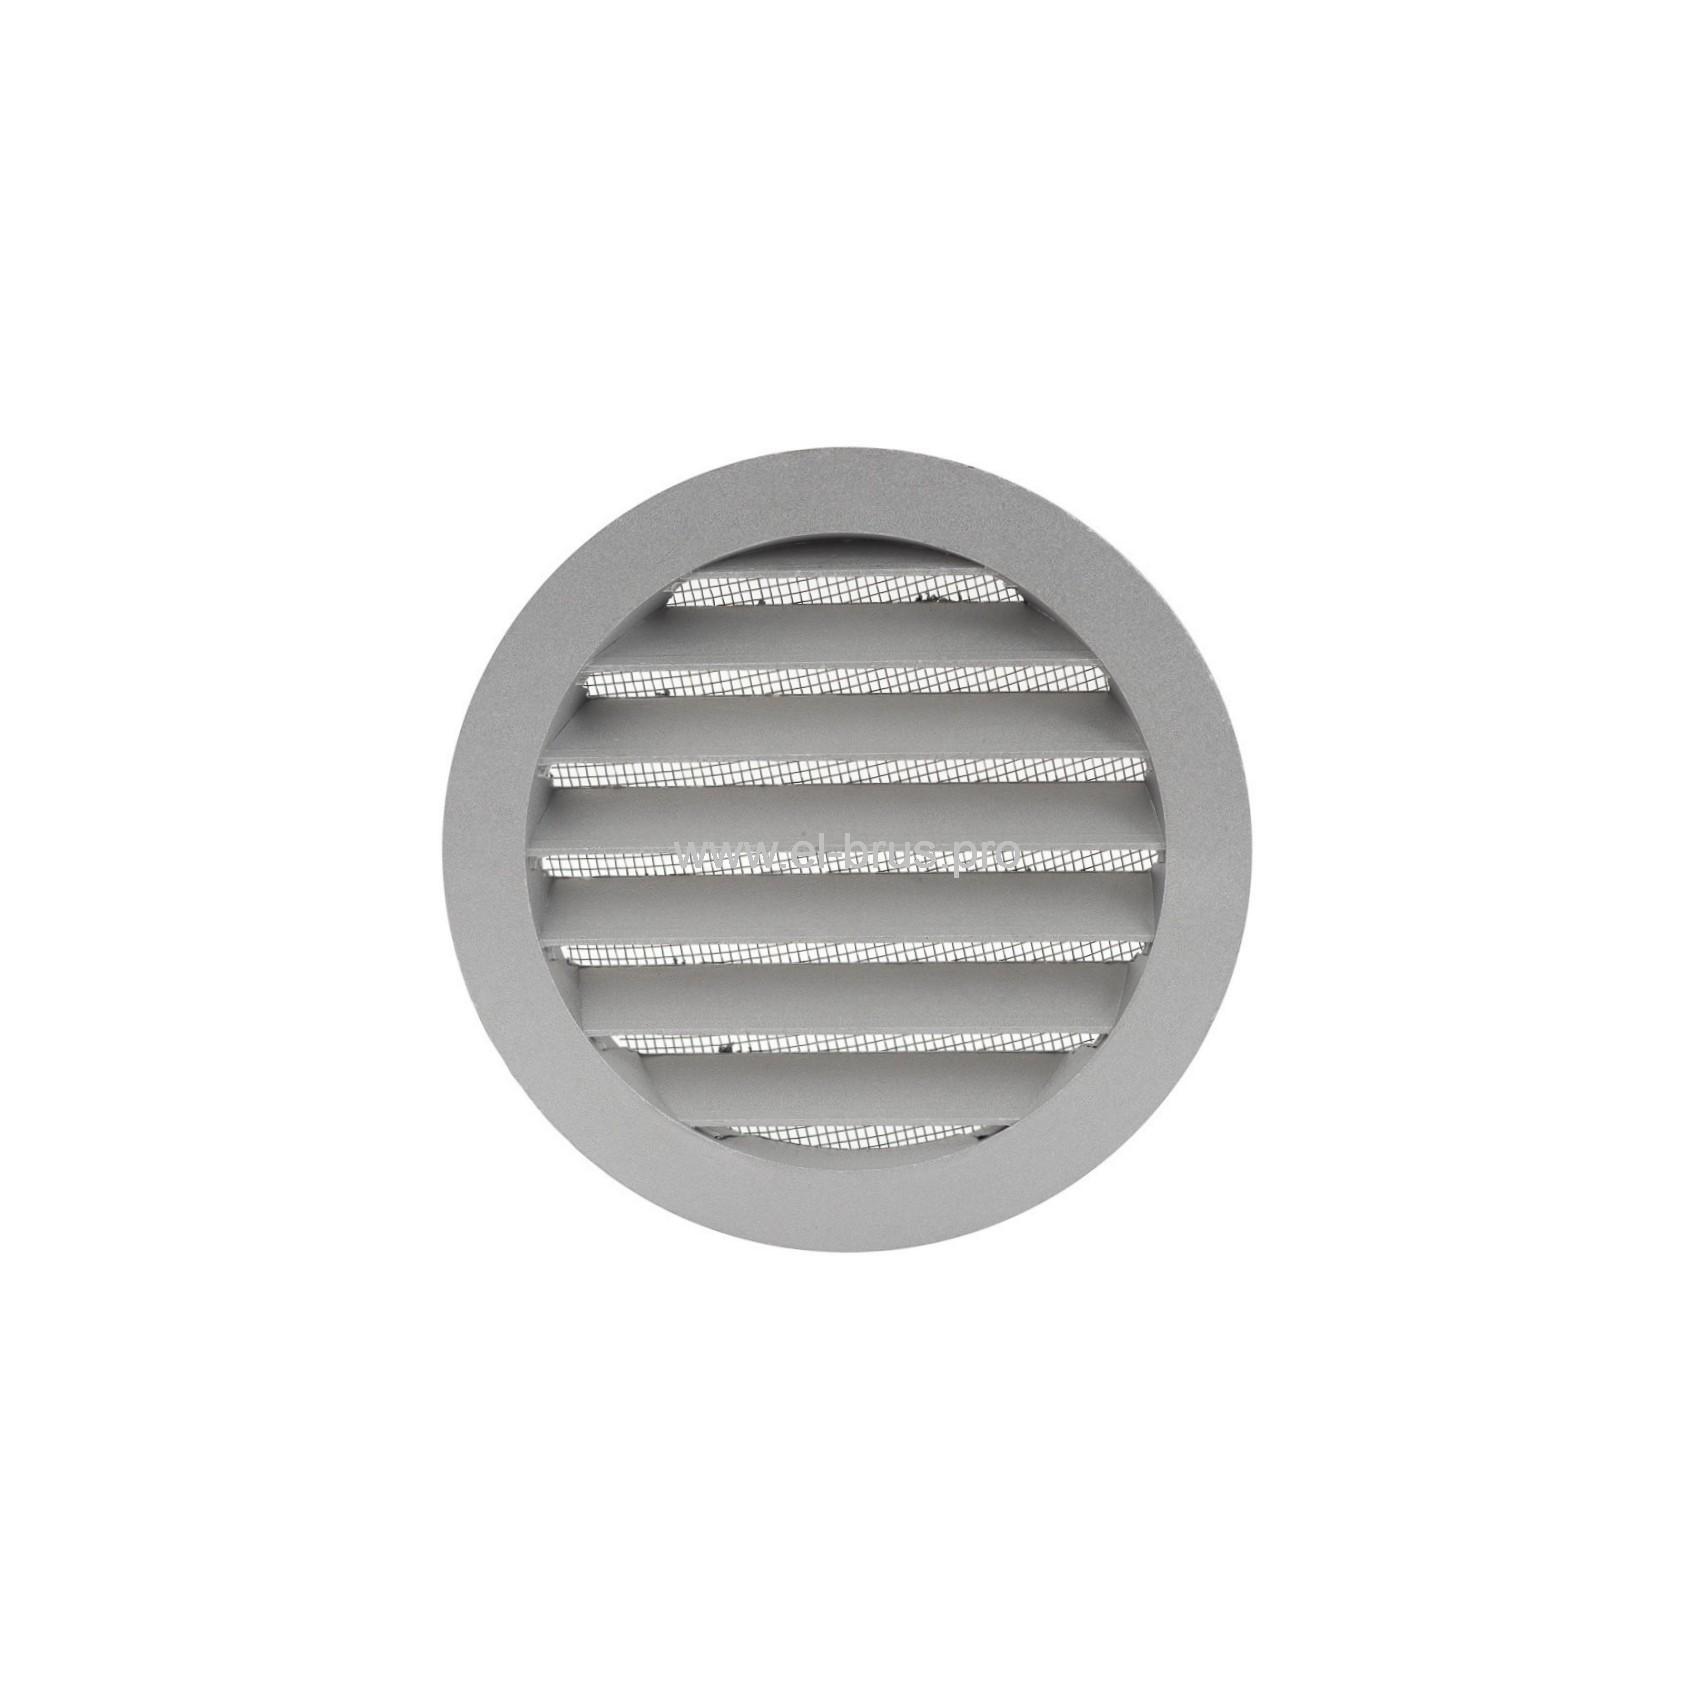 Решетка вент. круглая с сеткой Ø150мм и фланцем Ø125мм ERA 12,5РКМ